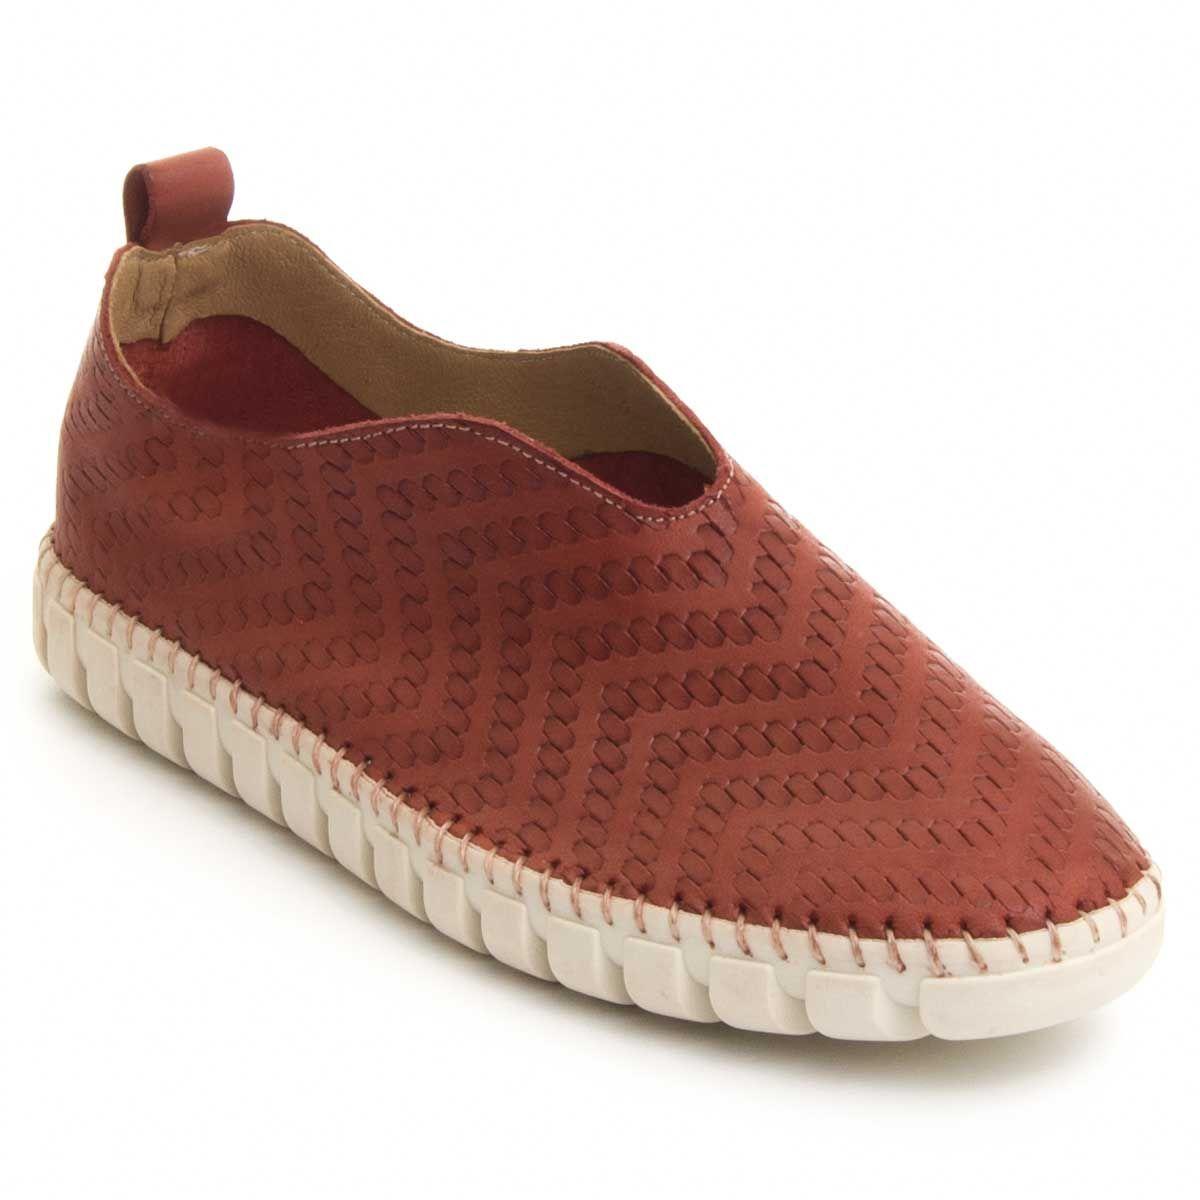 Purapiel Slip-On Moccasin in Red